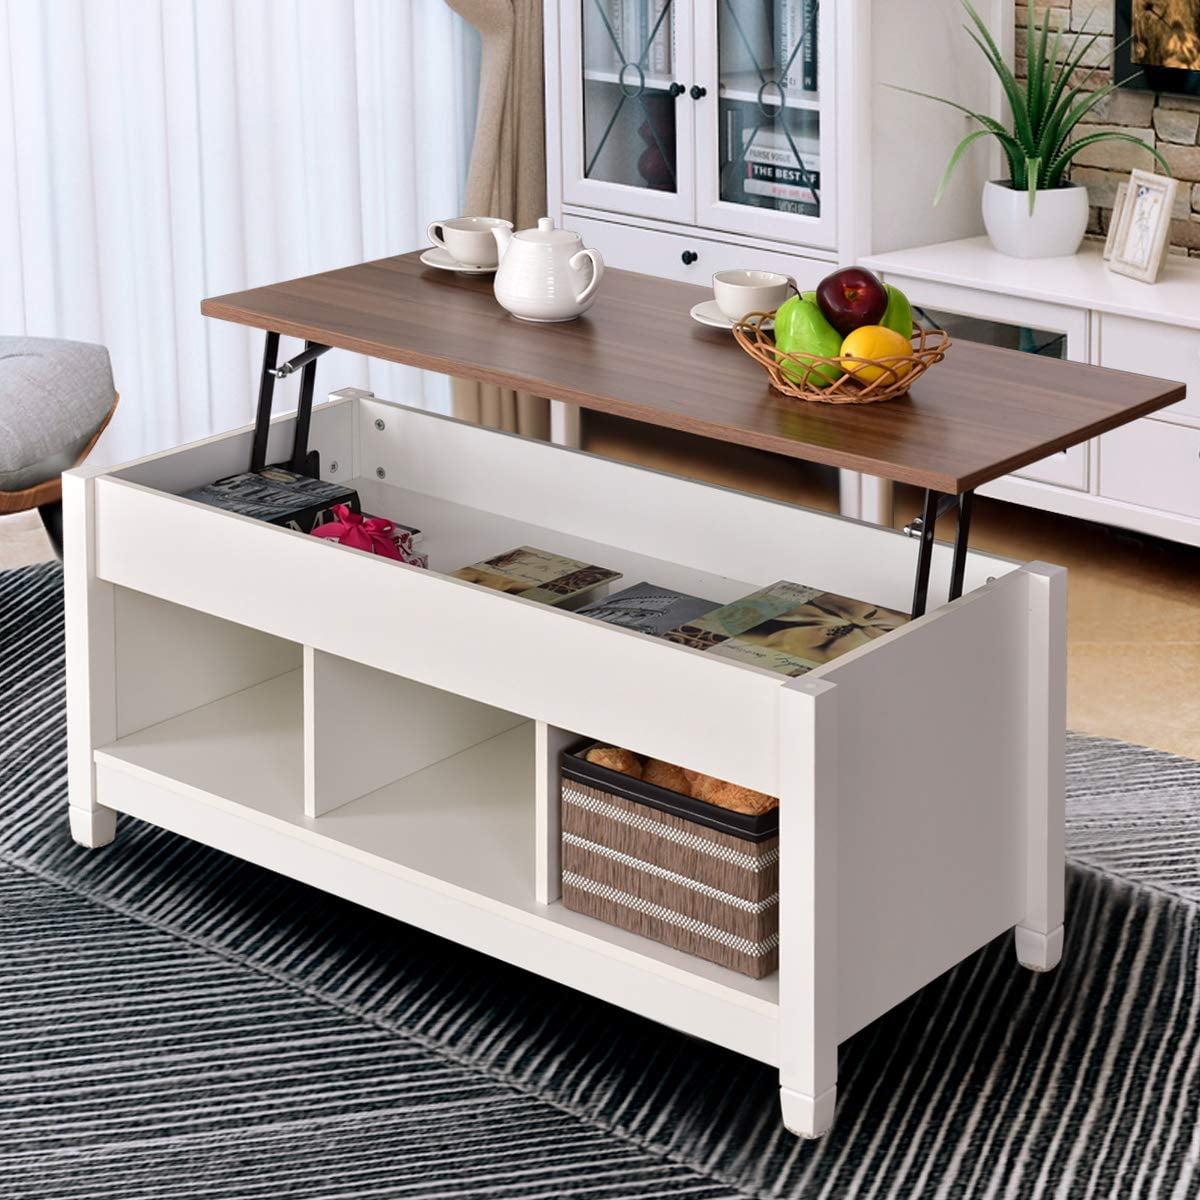 - Best Space-Saving Coffee Tables POPSUGAR Home